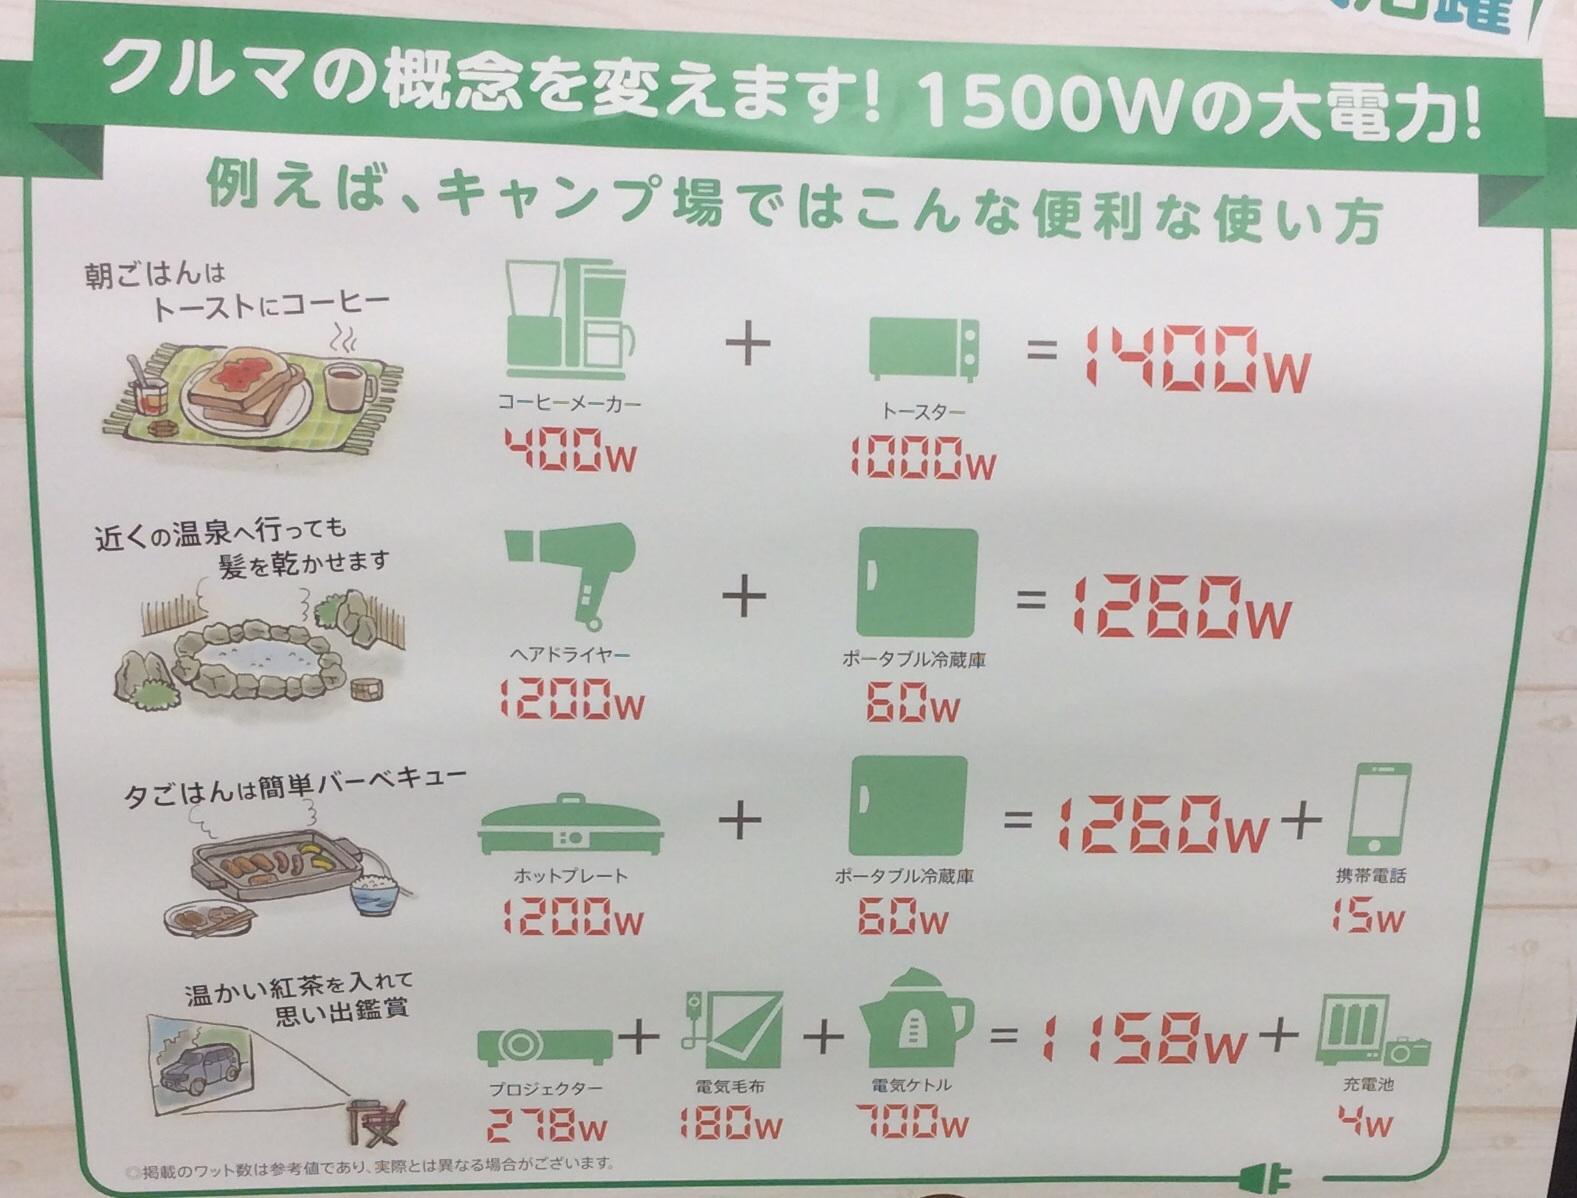 https://www.hyogo-mitsubishi.com/shop/akashi/files/1478c17980c83b3119233a0eff9e85987e2c3d5a.jpg